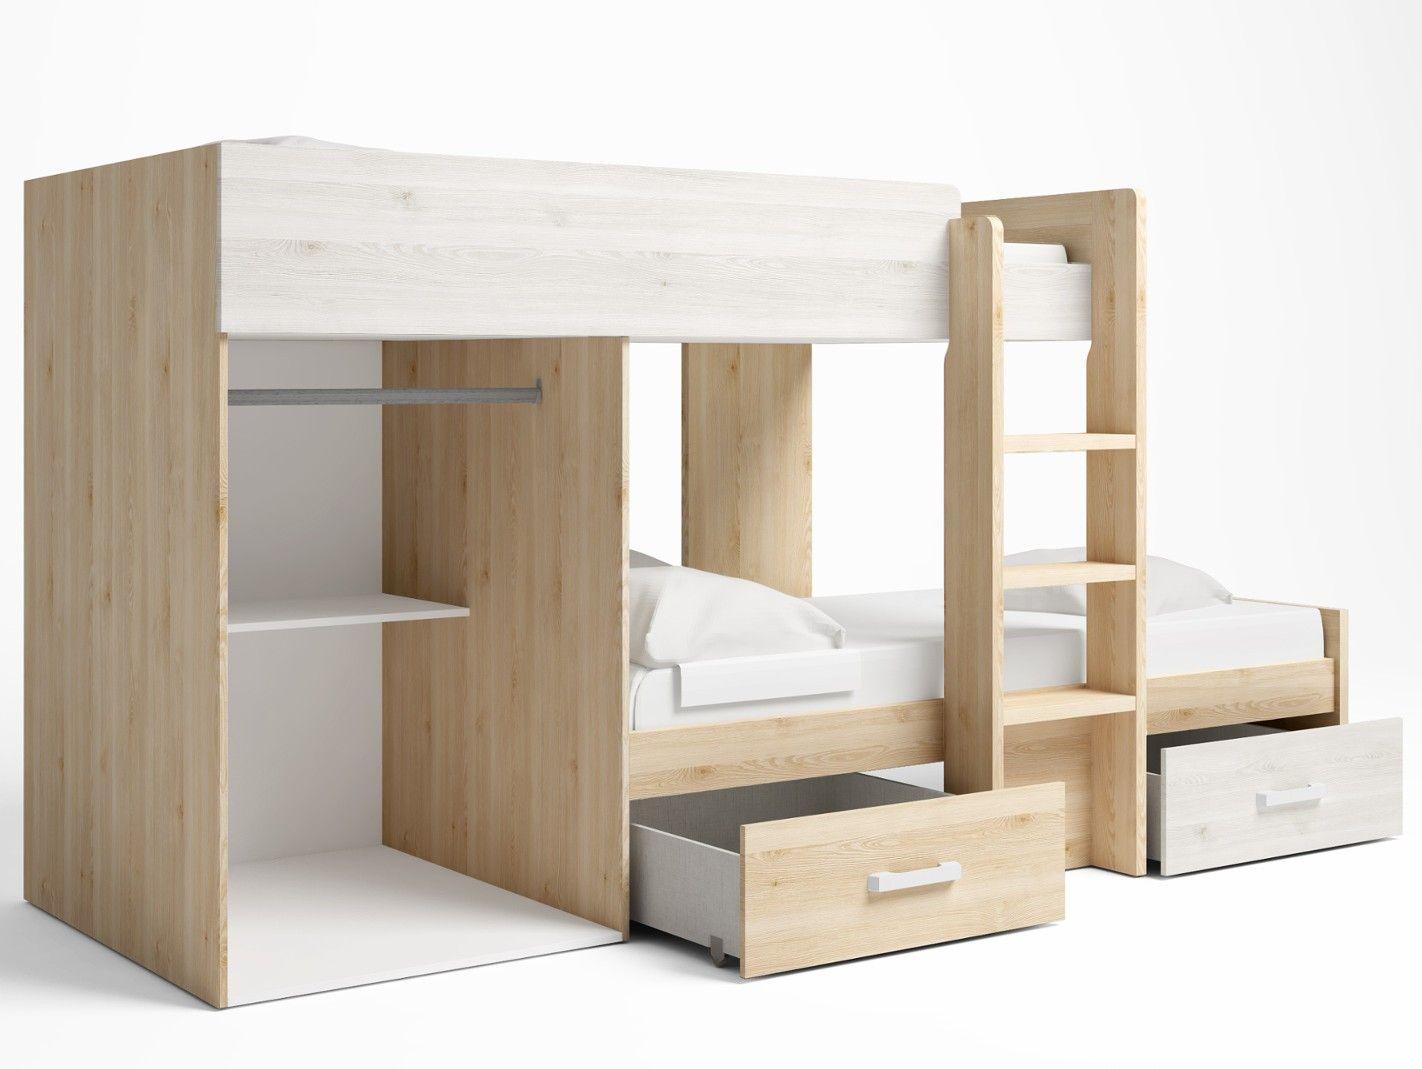 Sofá cama clic clac polipiel blanco